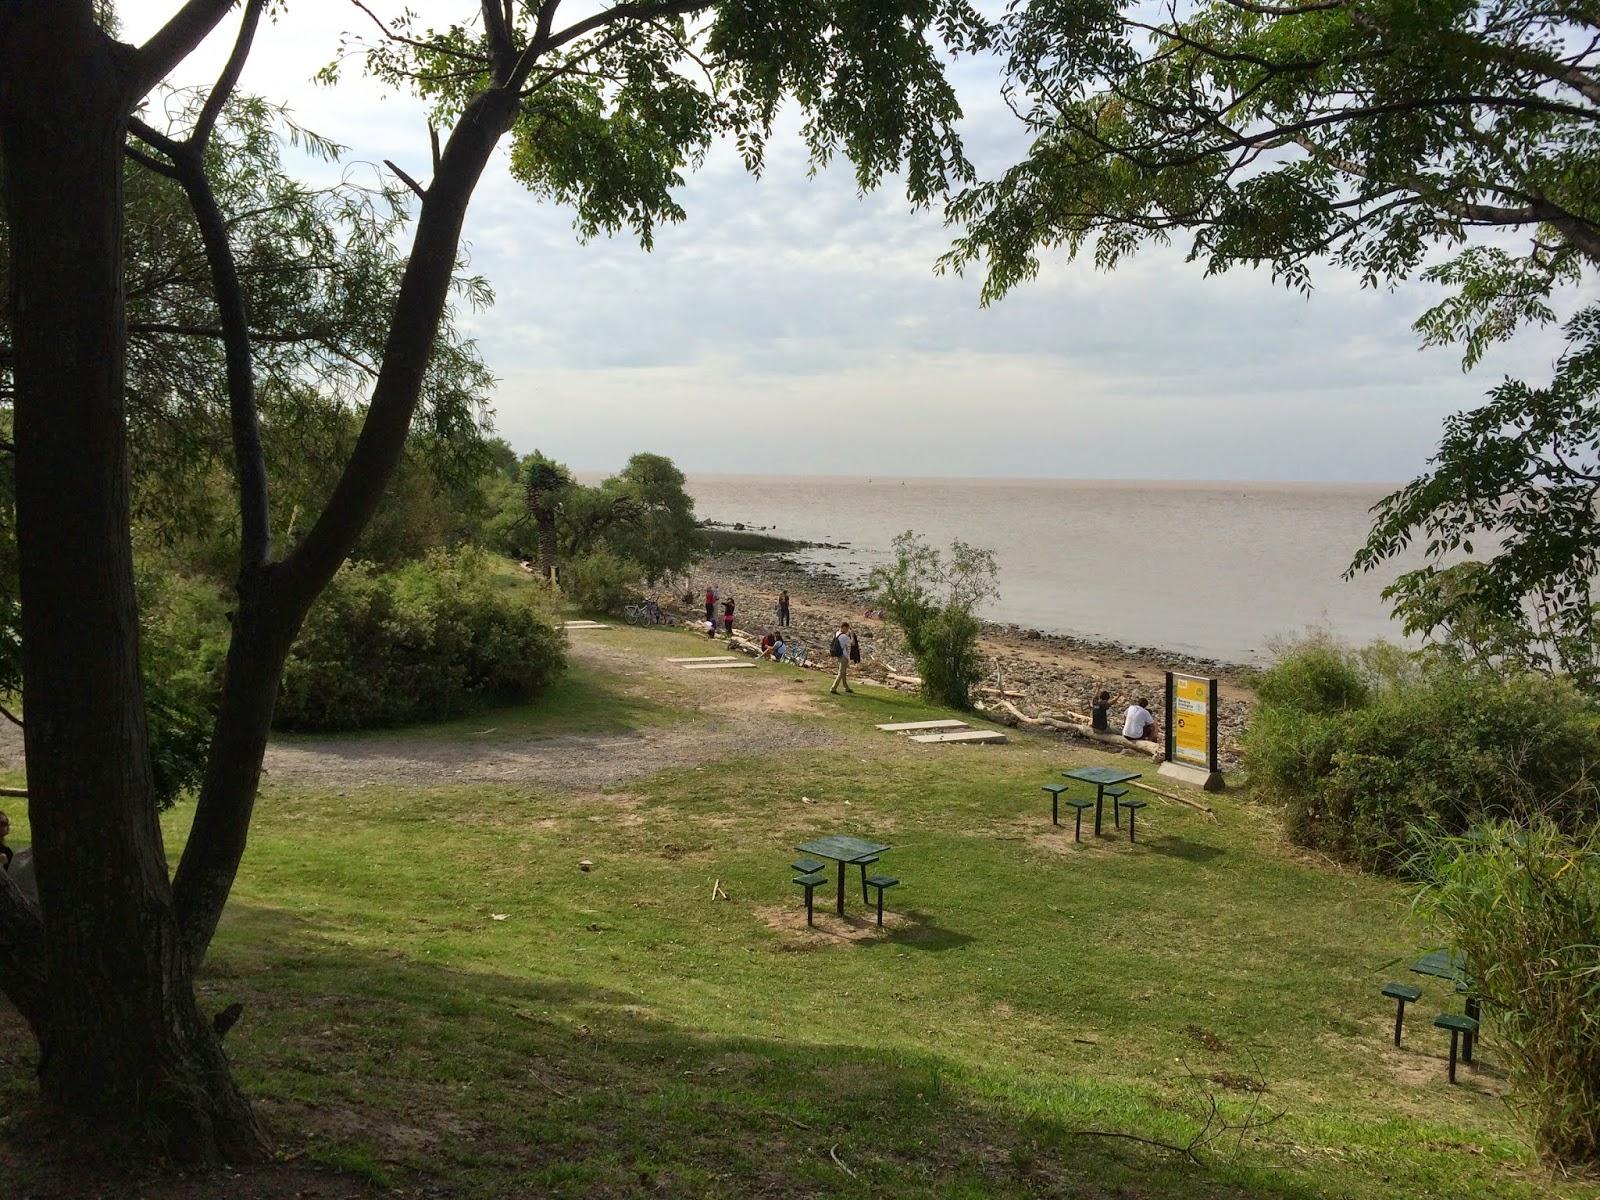 park_reserva_ecologica_argentina_10.jpg